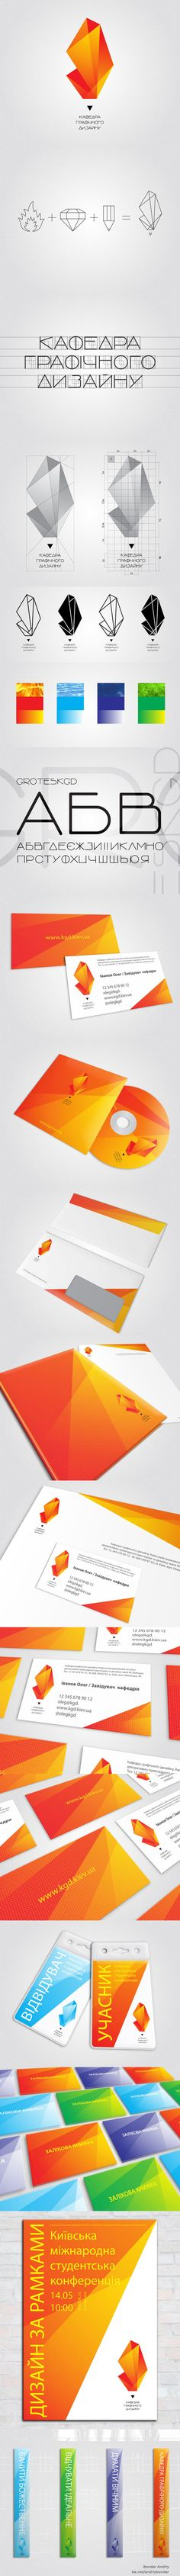 Department of Graphic Design. Branding. #branding #logo